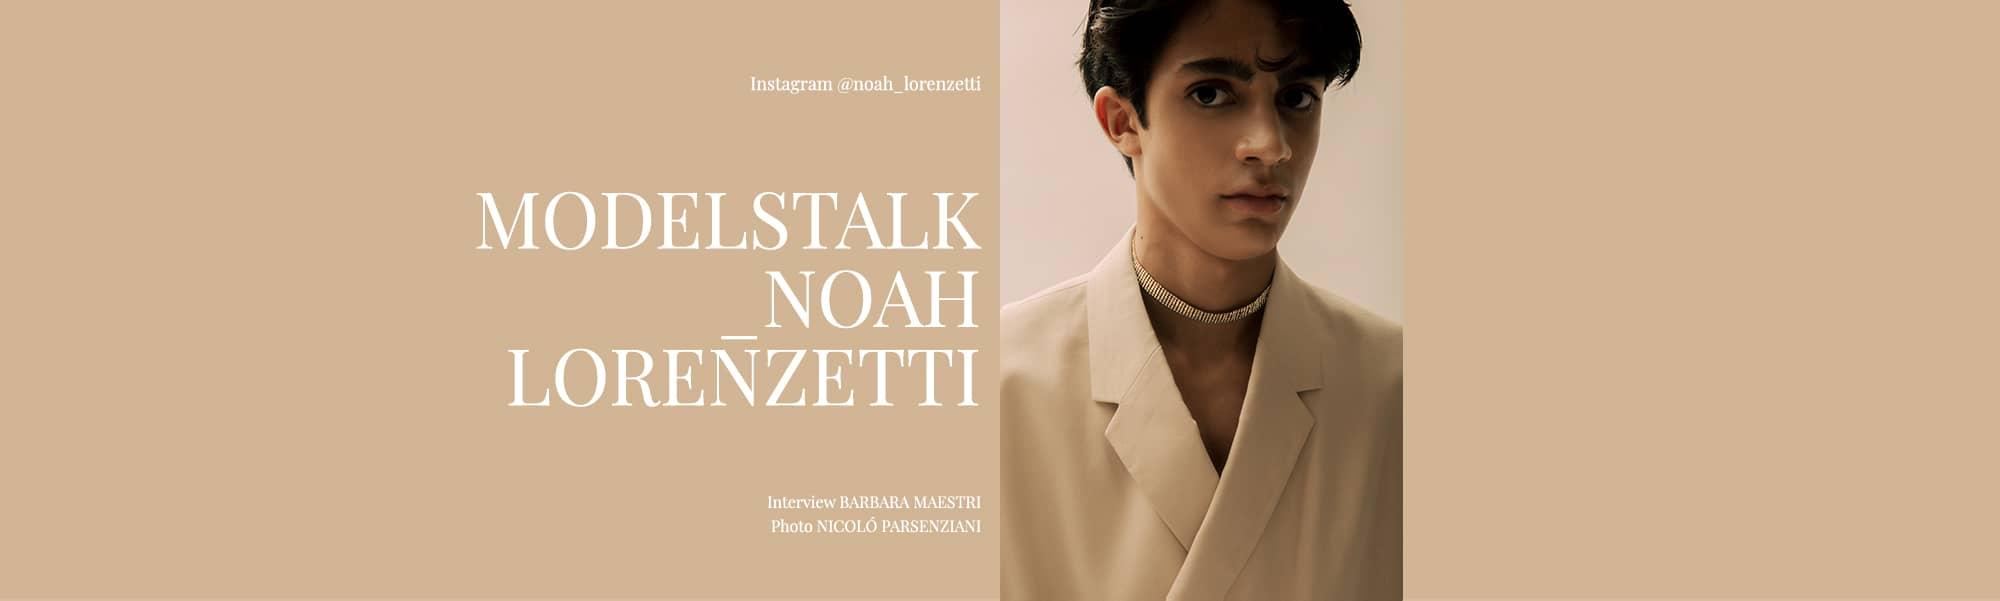 thegreatestmagazine-talking-heads-noah-lorenzetti-01